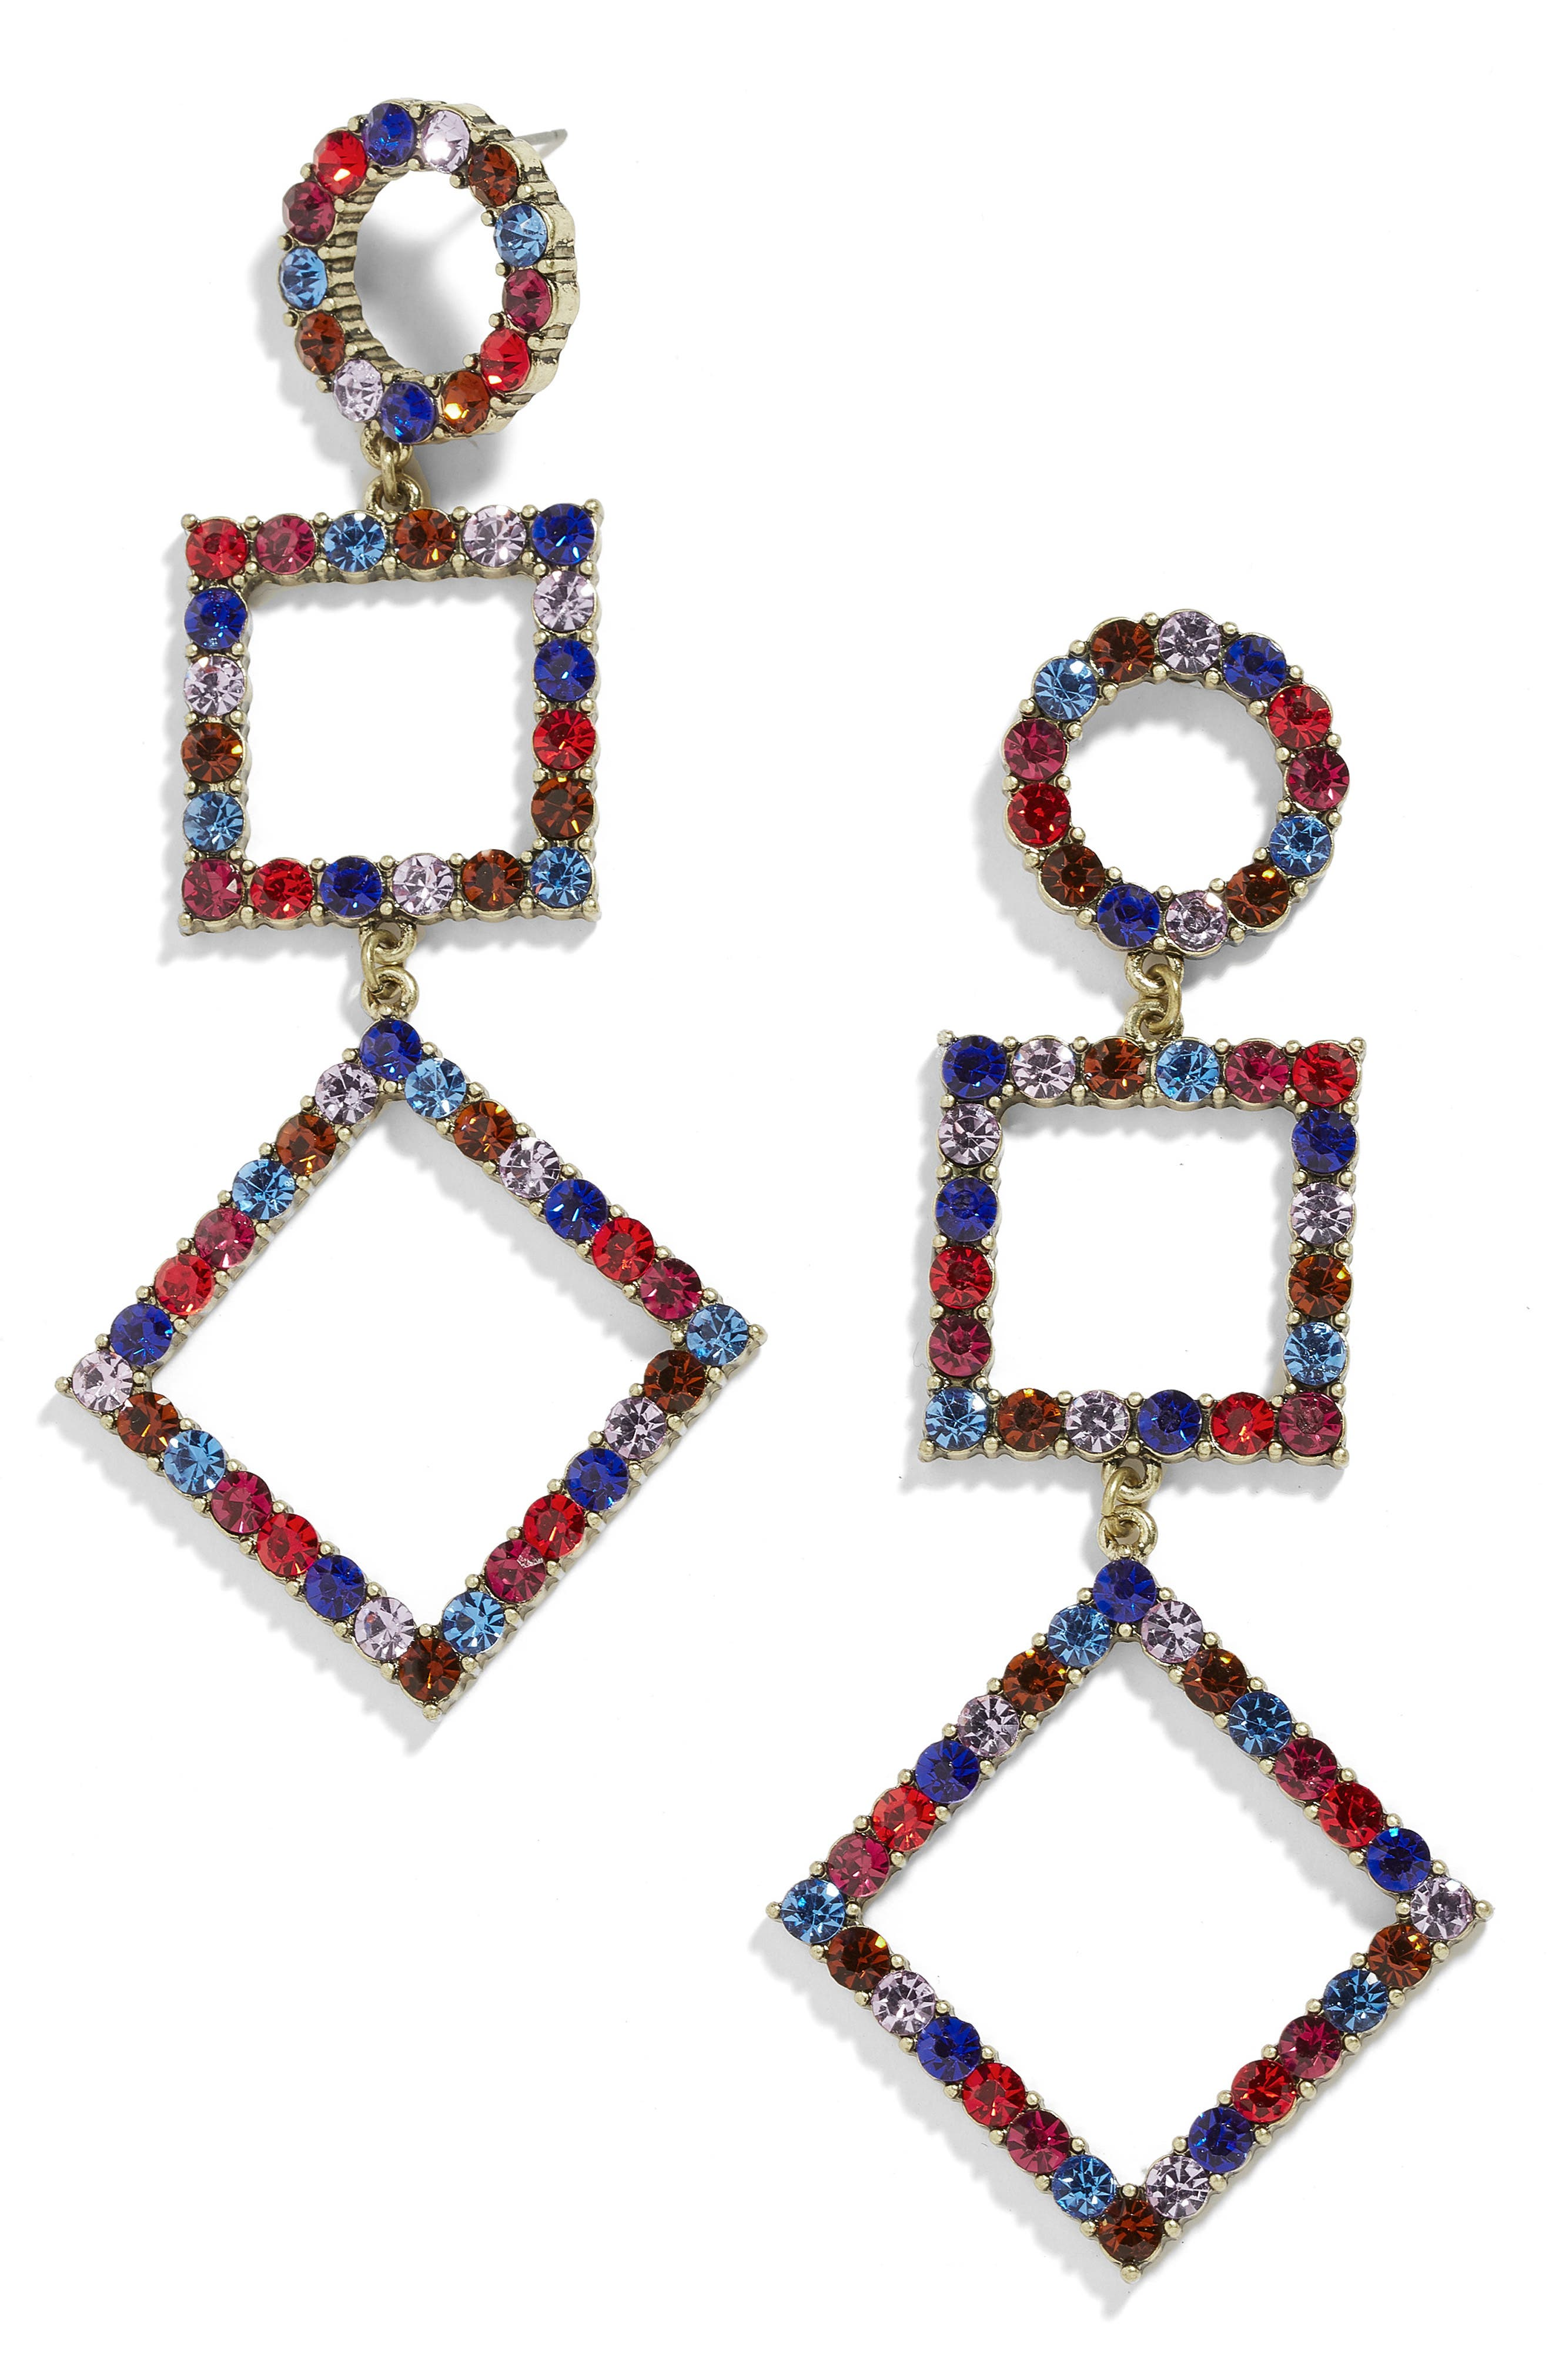 Seres Drop Earrings,                             Main thumbnail 1, color,                             400